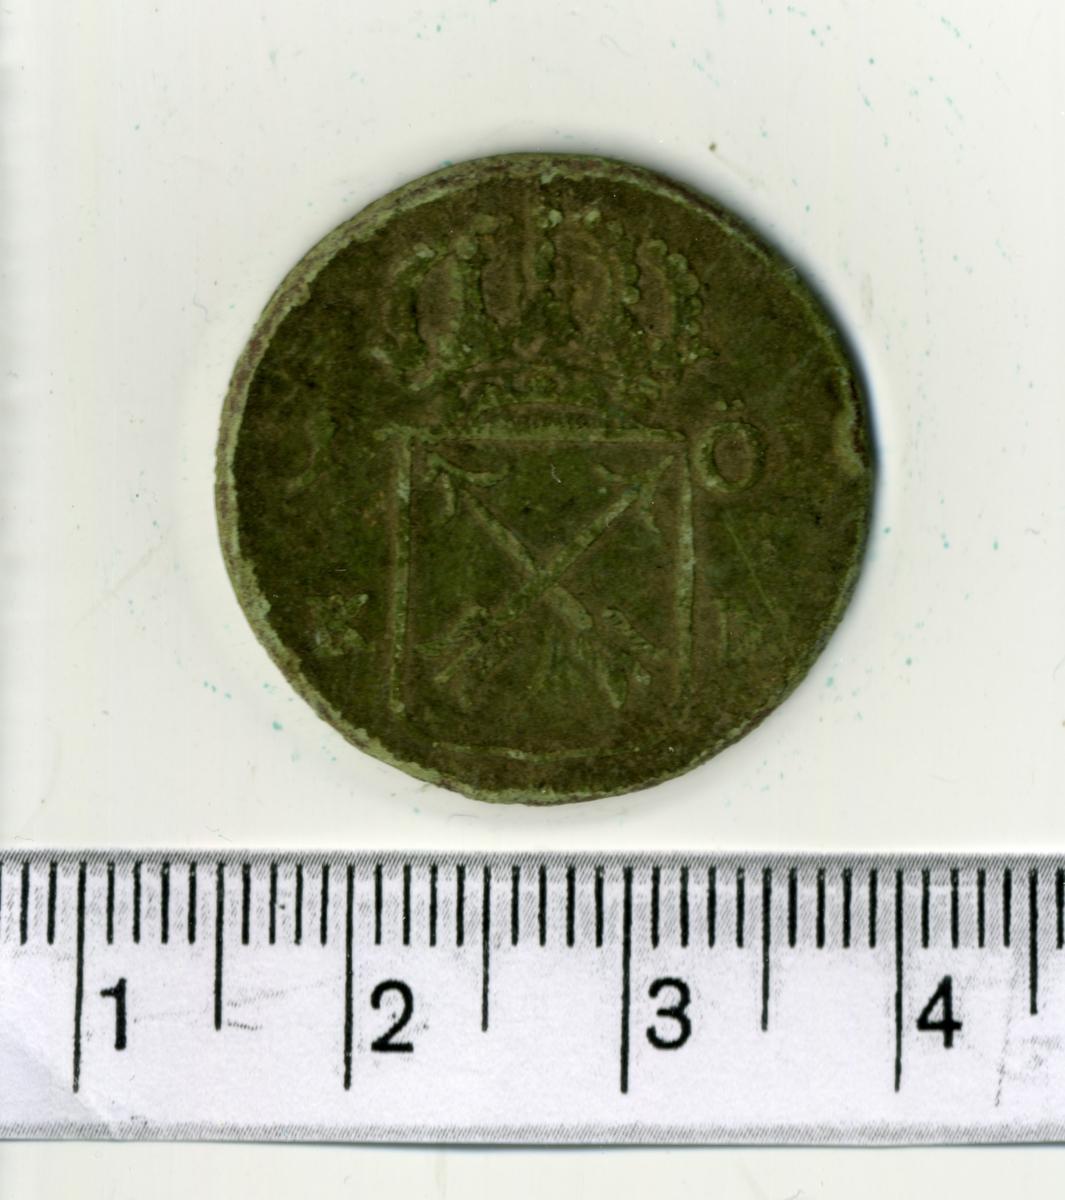 8. 1 öre KM 1724 Fredrik I. Stockholm.